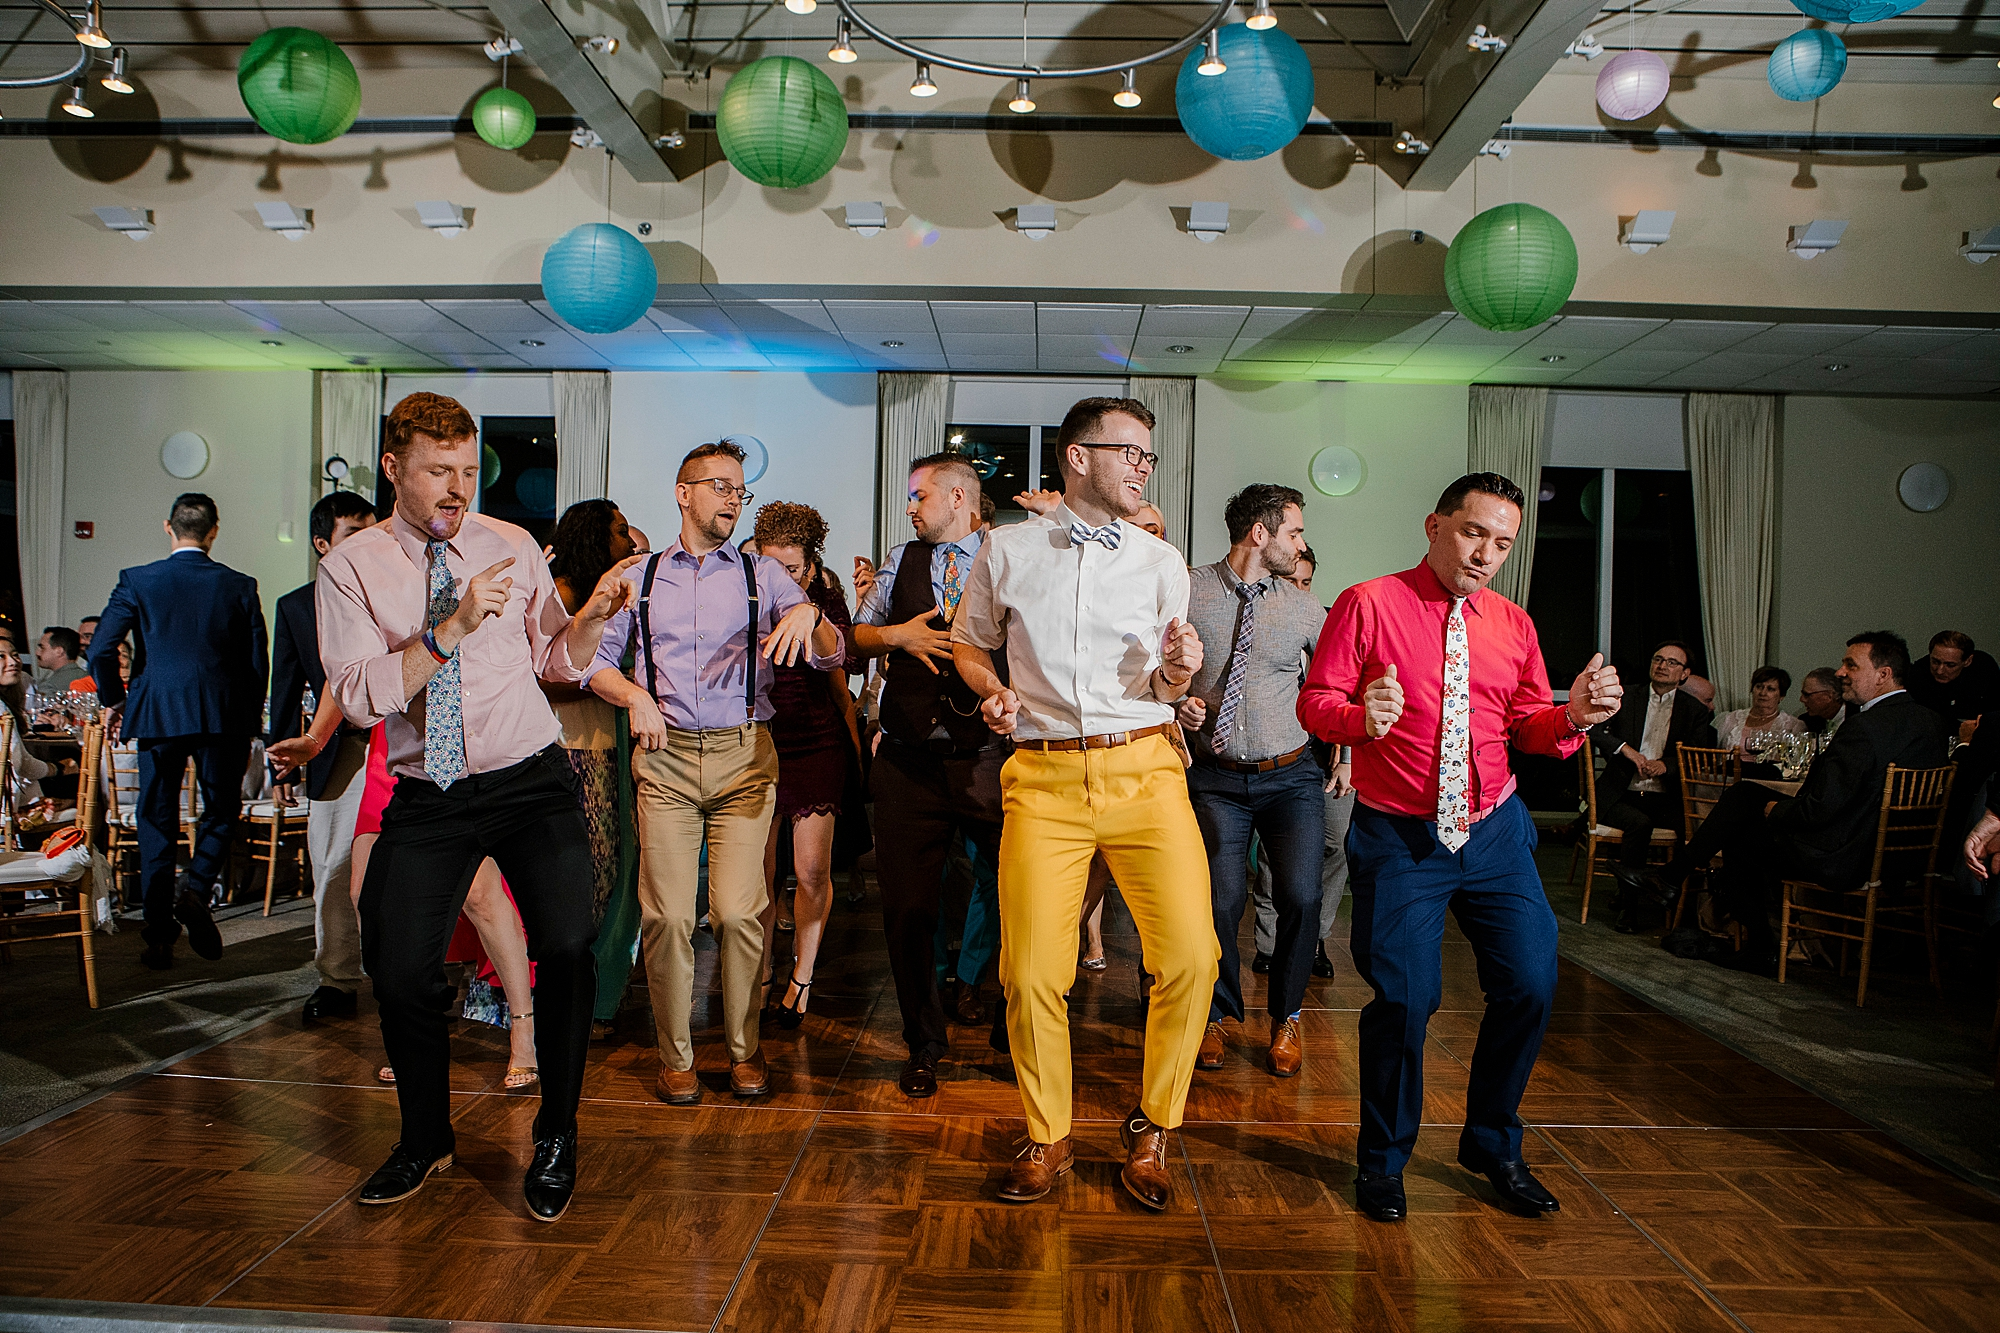 Dan_and_Byron_Love_by_Joe_Mac_Philadelphia_Wedding_LGBTQ_Photography_Gay_Independence_visitor_Center_136.JPG